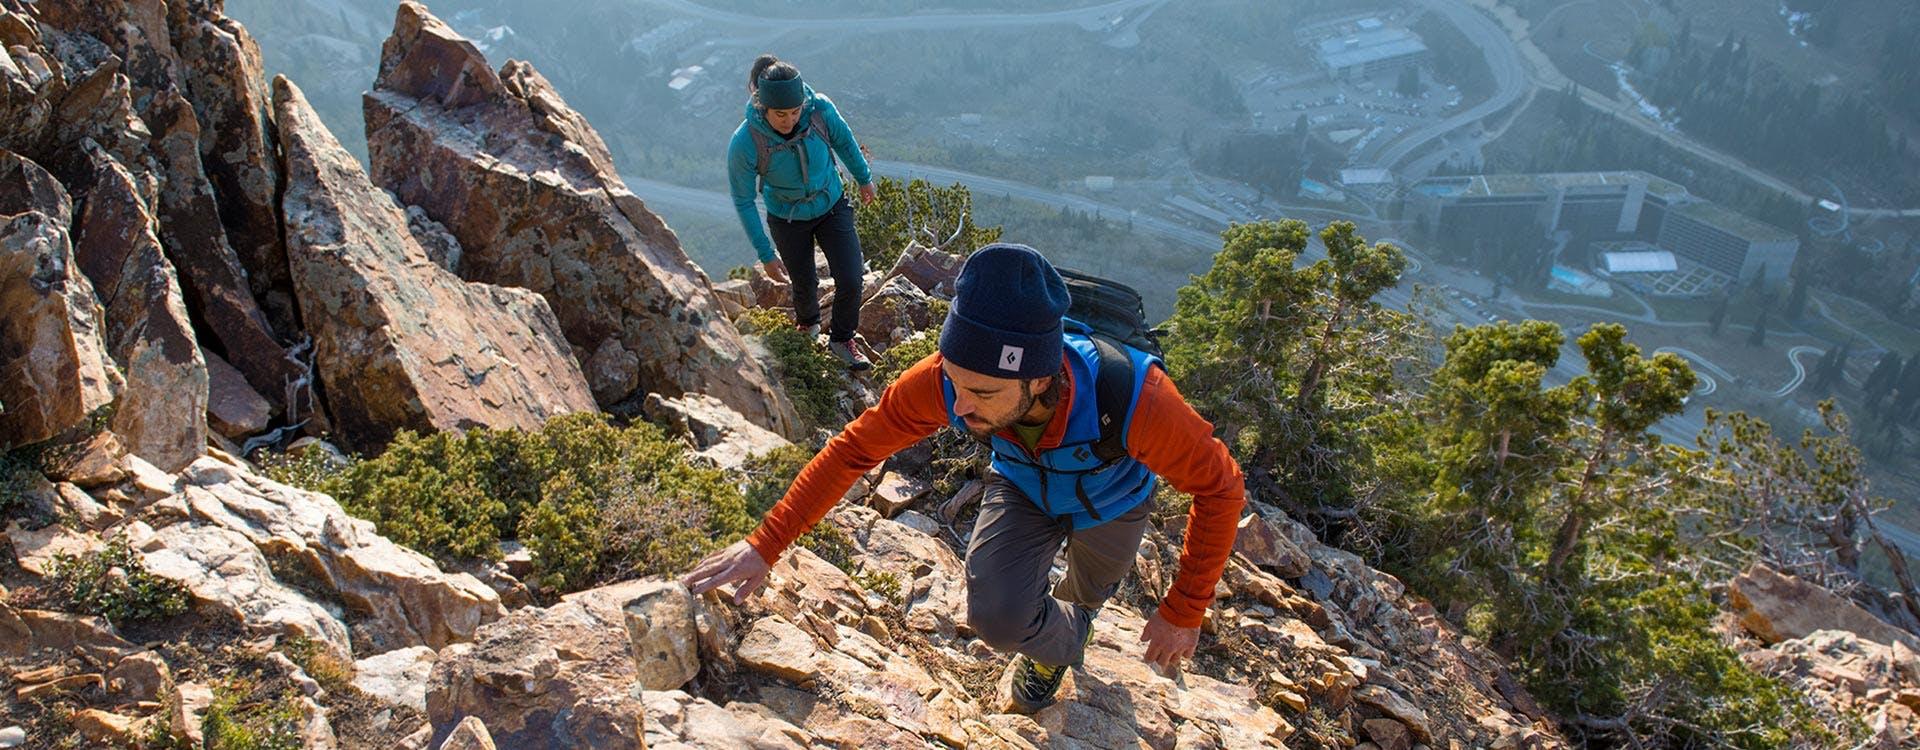 man and woman climbing a ridge